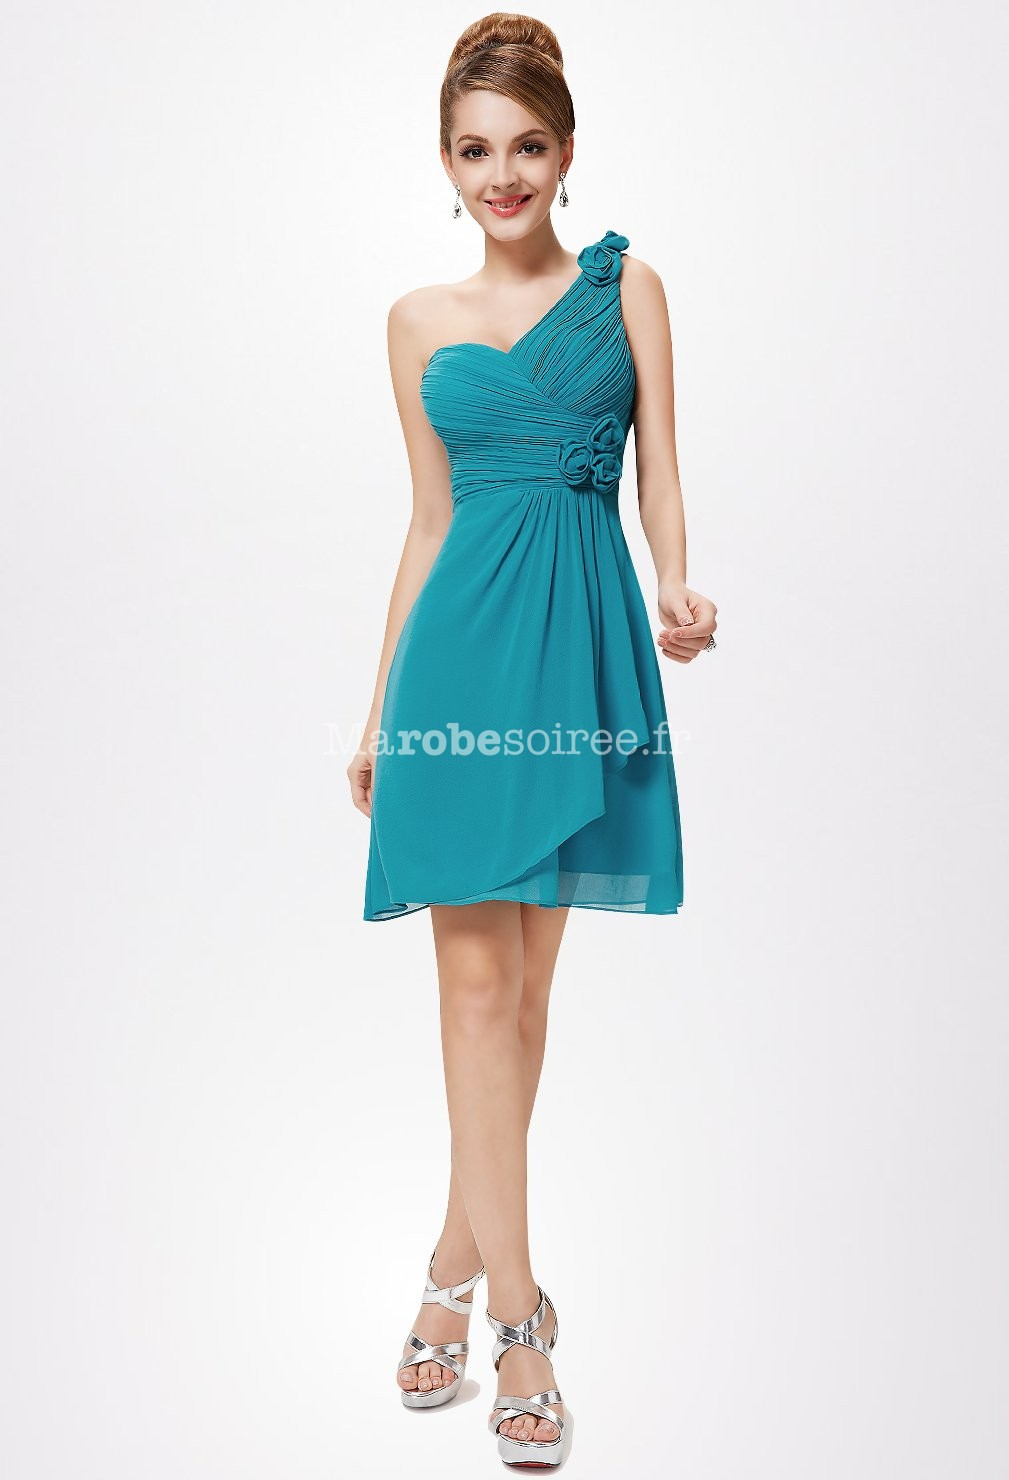 robe la mode robe de soiree courte bustier bleu. Black Bedroom Furniture Sets. Home Design Ideas